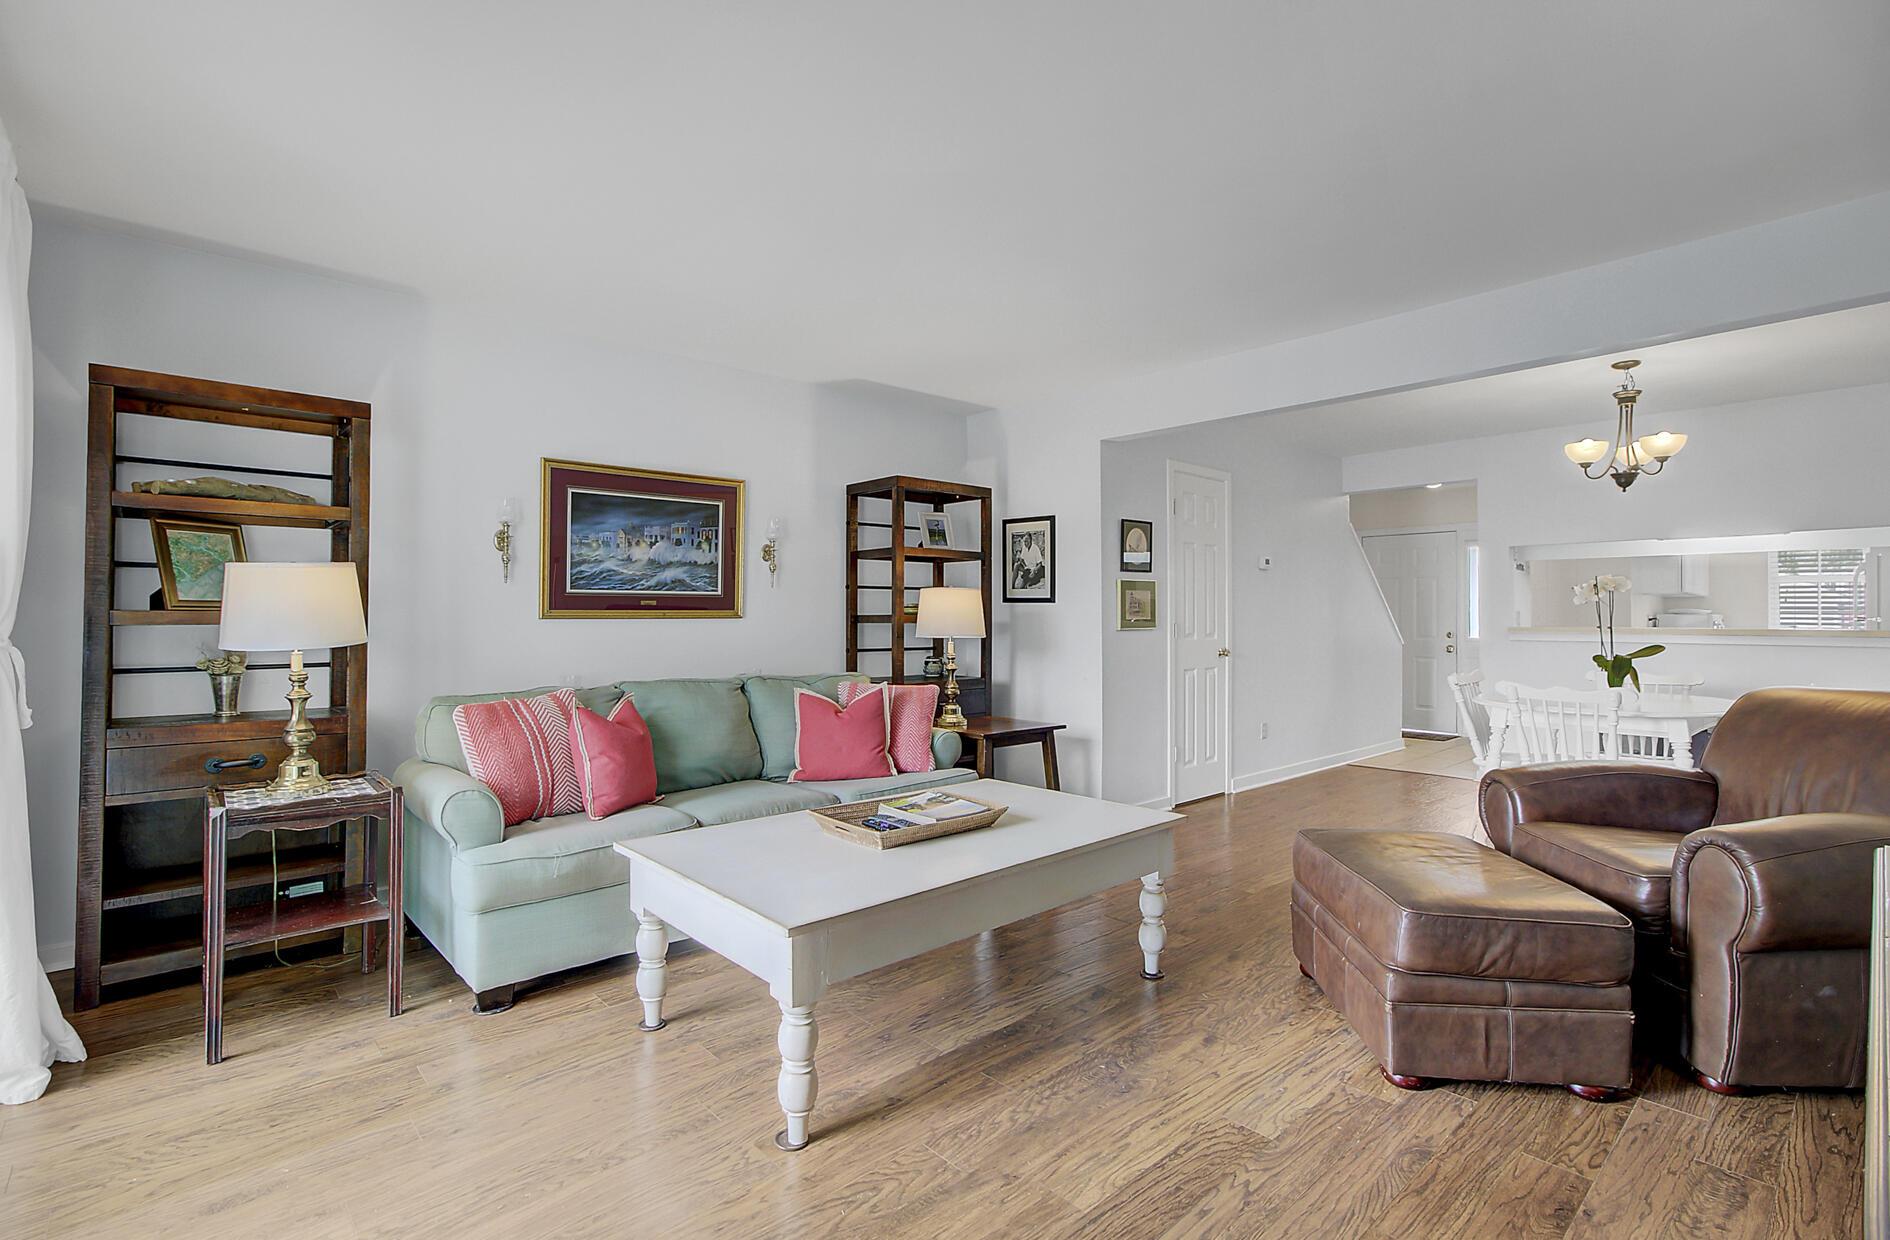 Riverland Place Homes For Sale - 234 Stefan, Charleston, SC - 13